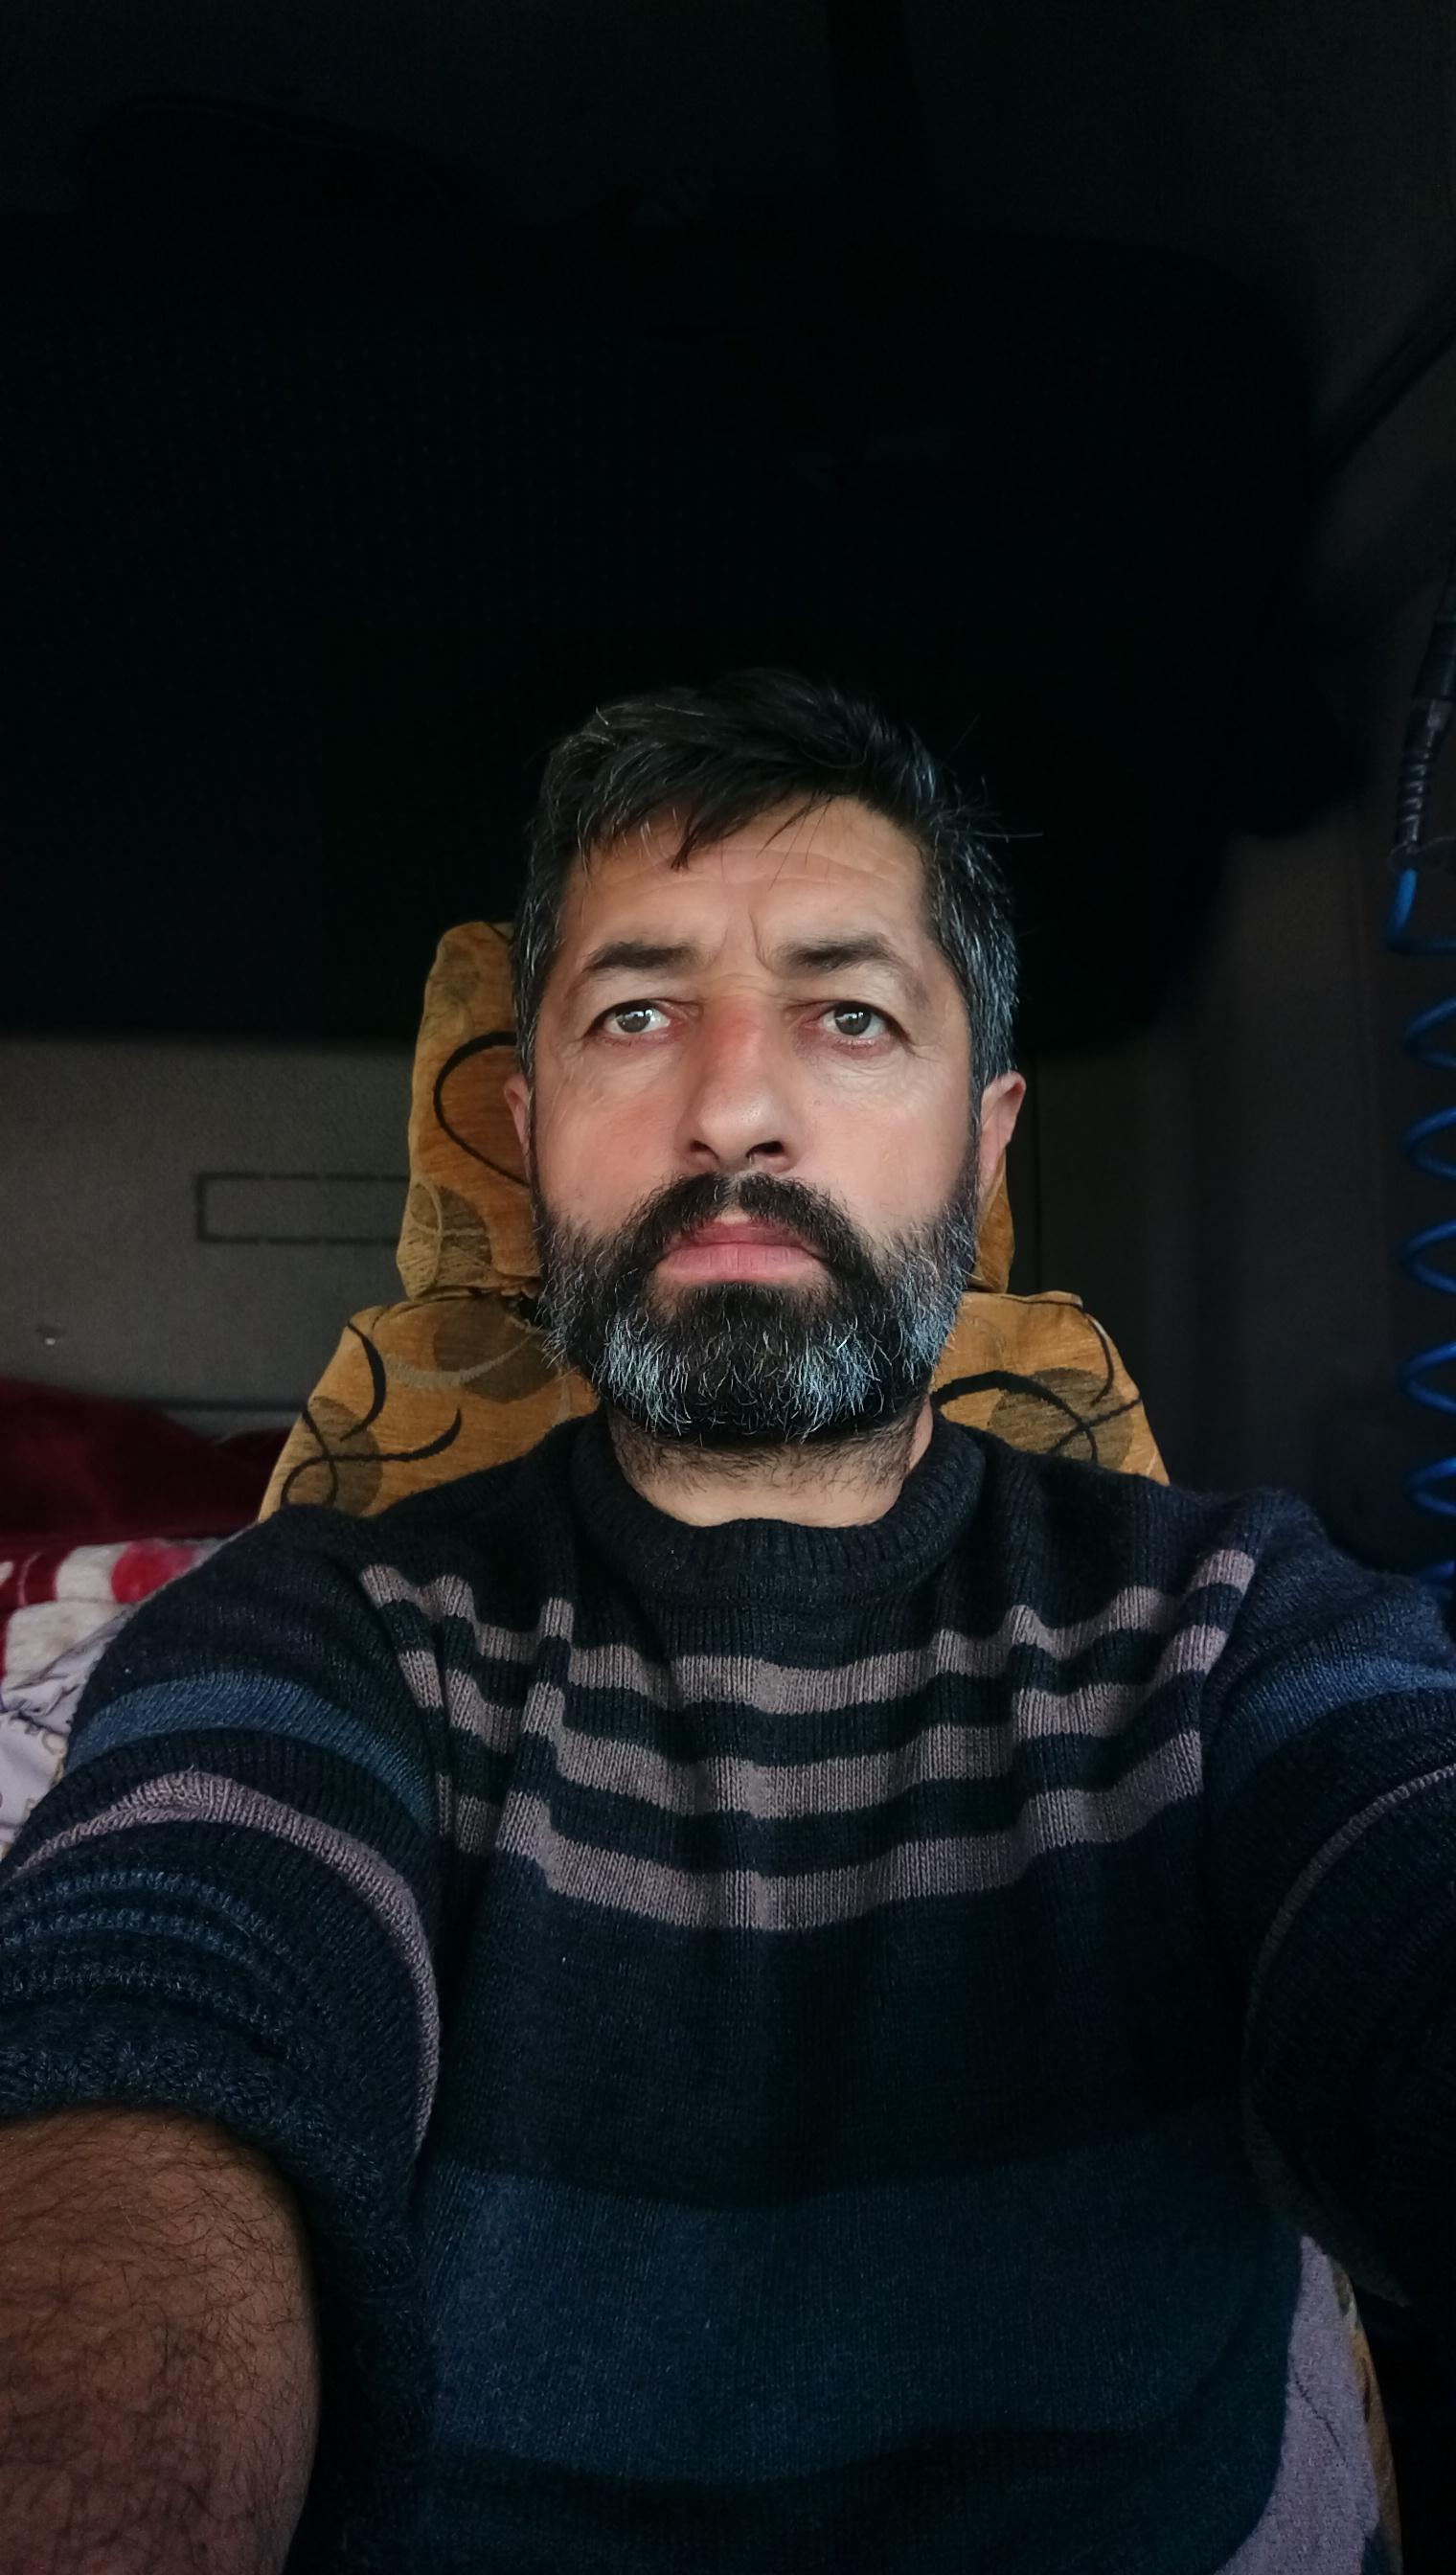 @nazif